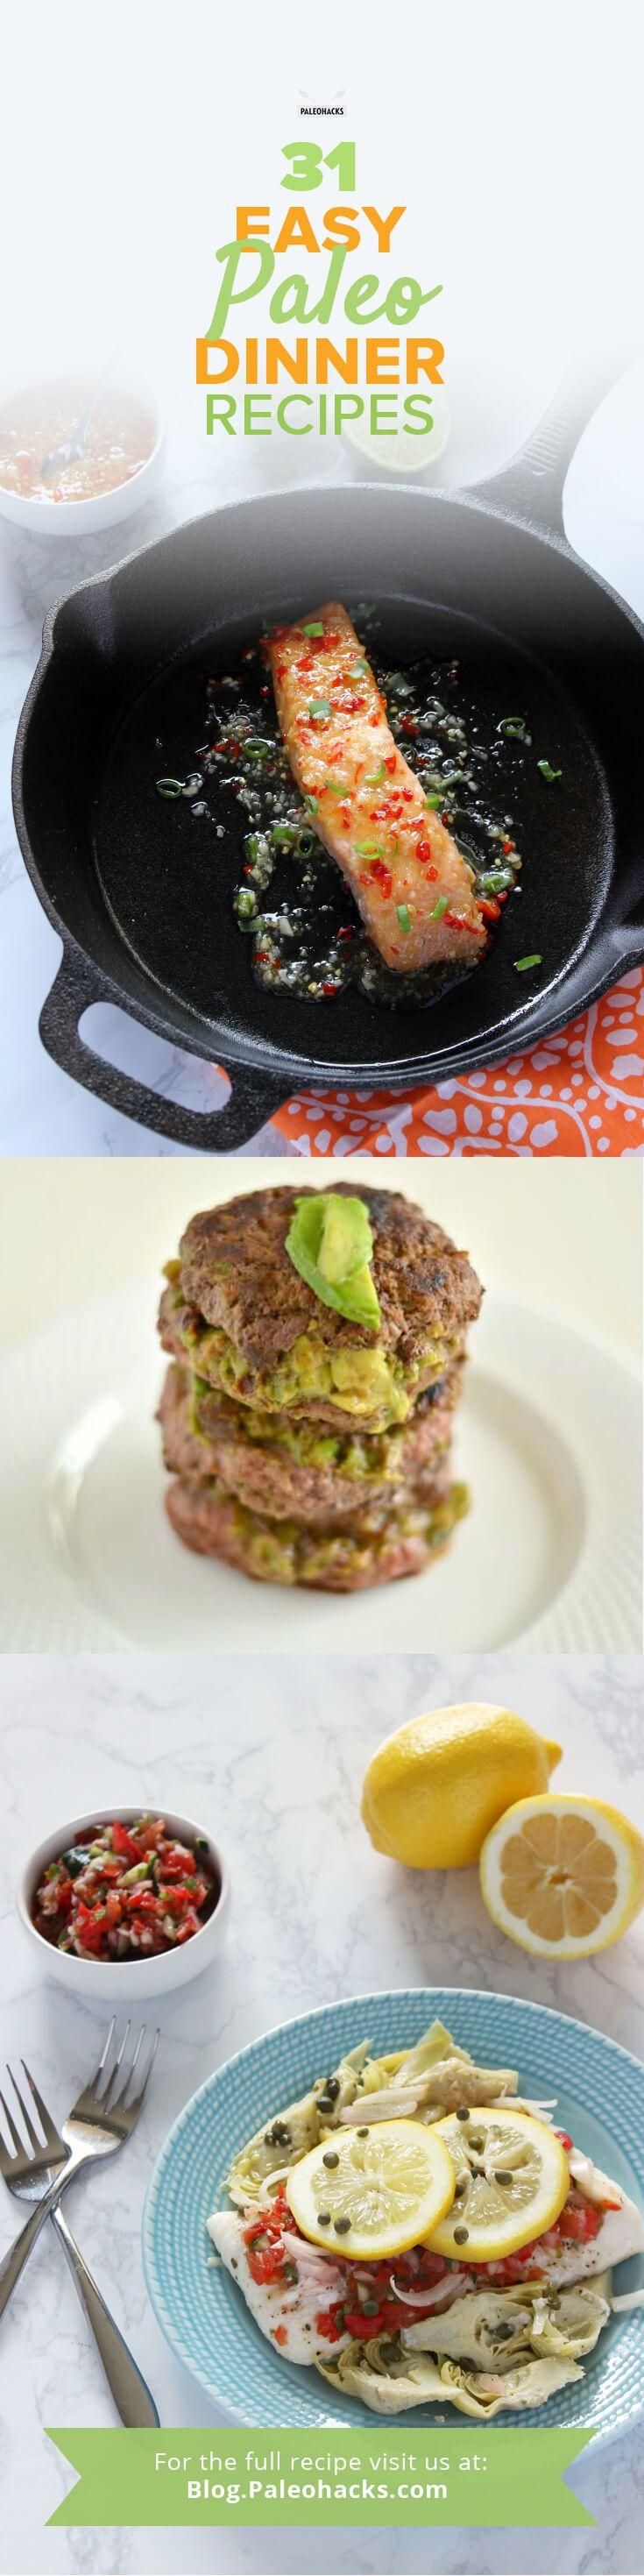 31 easy paleo dinner recipes healthy grain free copilation pin 31 easy paleo dinner recipesg forumfinder Choice Image